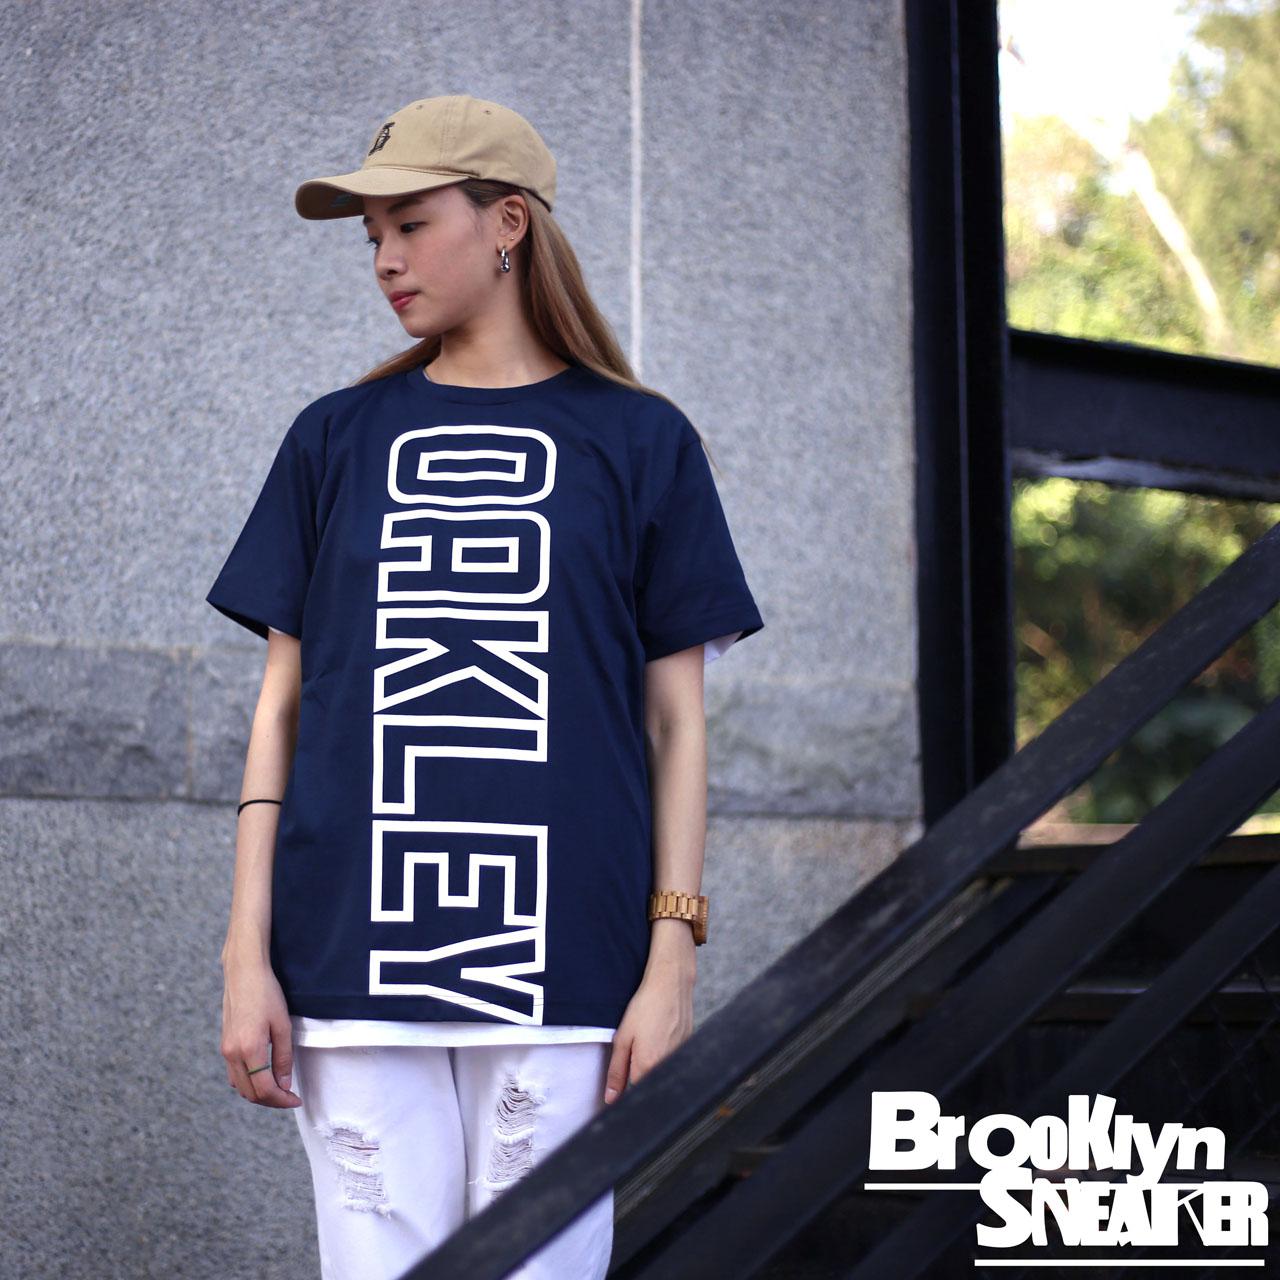 OAKLEY深藍色吸濕排汗直向大OAKLEY短袖短T布魯克林2017 4月456679JP60B